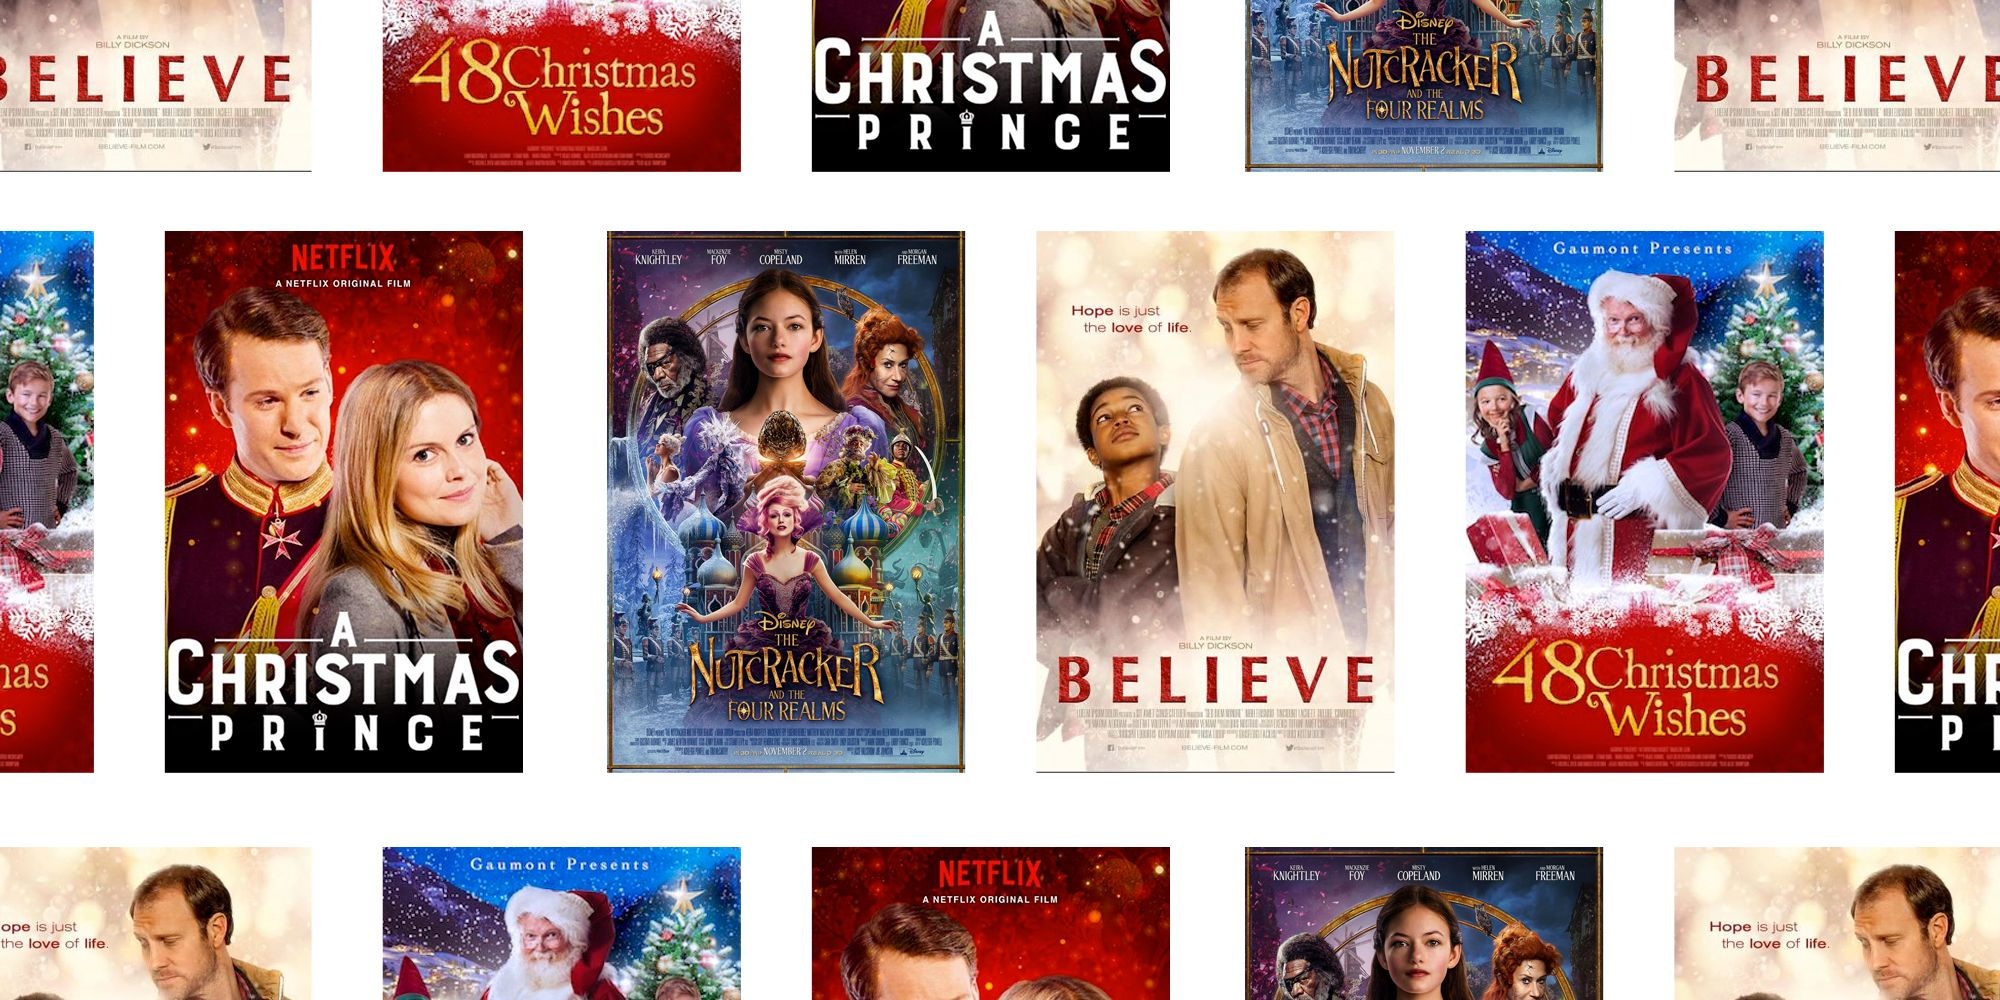 netflix christmas movies 2020 list